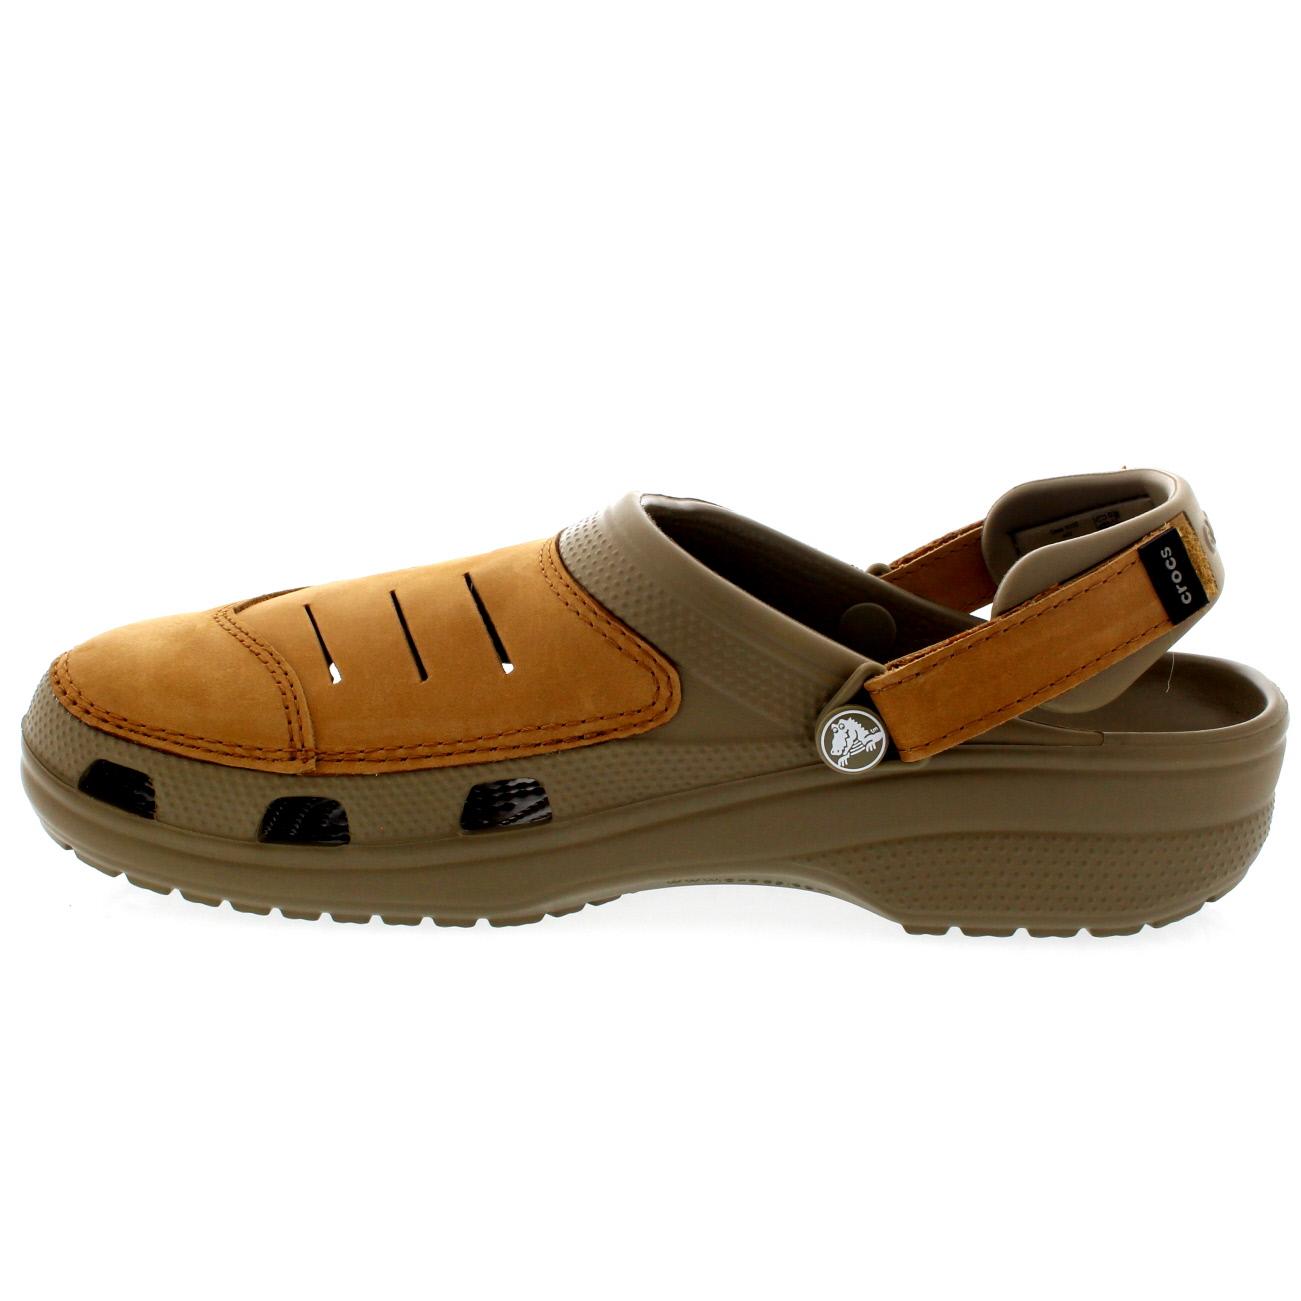 Mens crocs Yukon Slip On Beach Lightweight Casual Clogs Sandals Mules